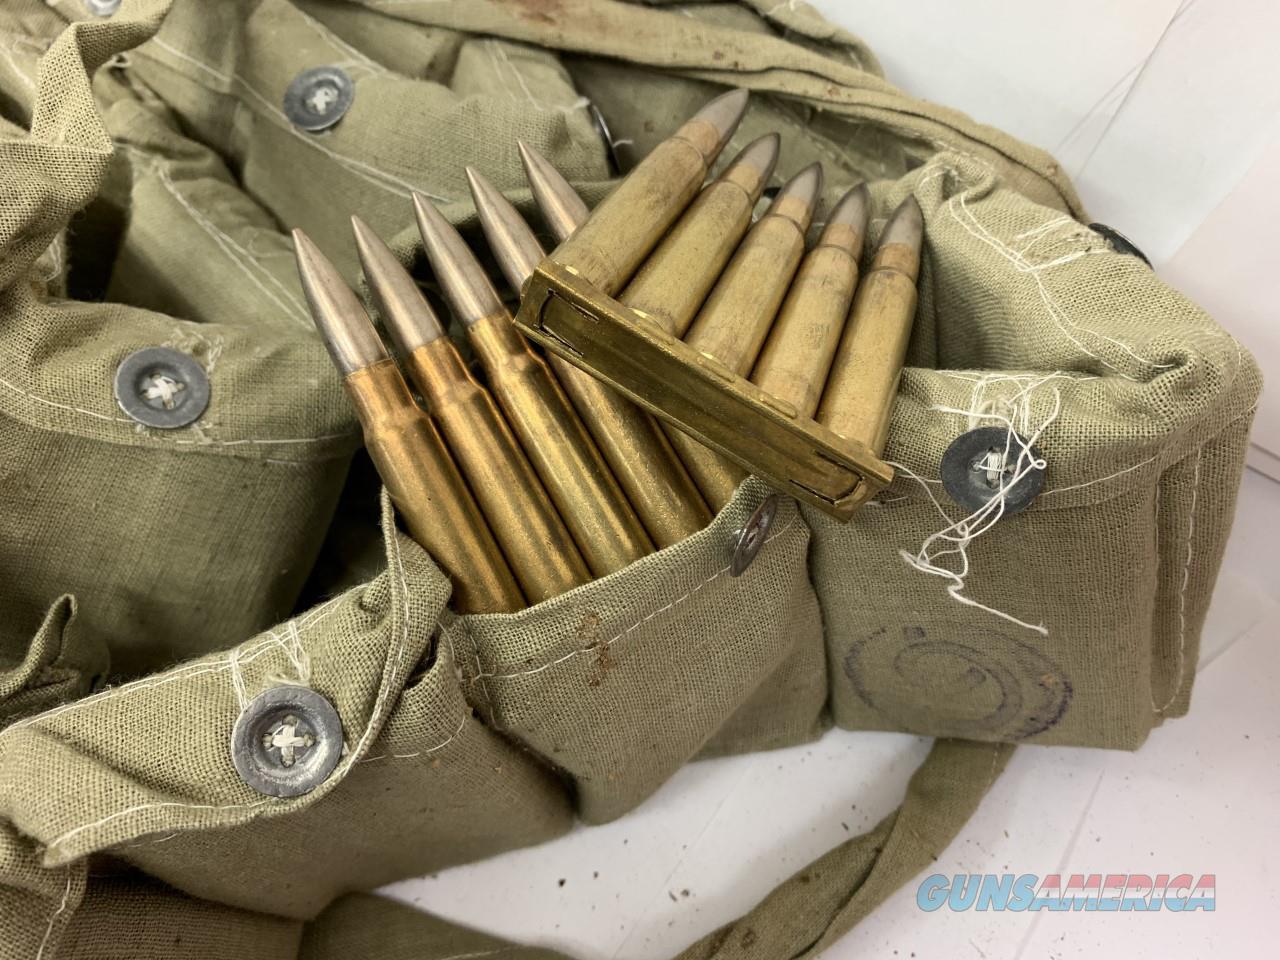 7.9MM F.S. 1947 T.C.Turkish Ammo w/ Bandoleers  Non-Guns > Ammunition